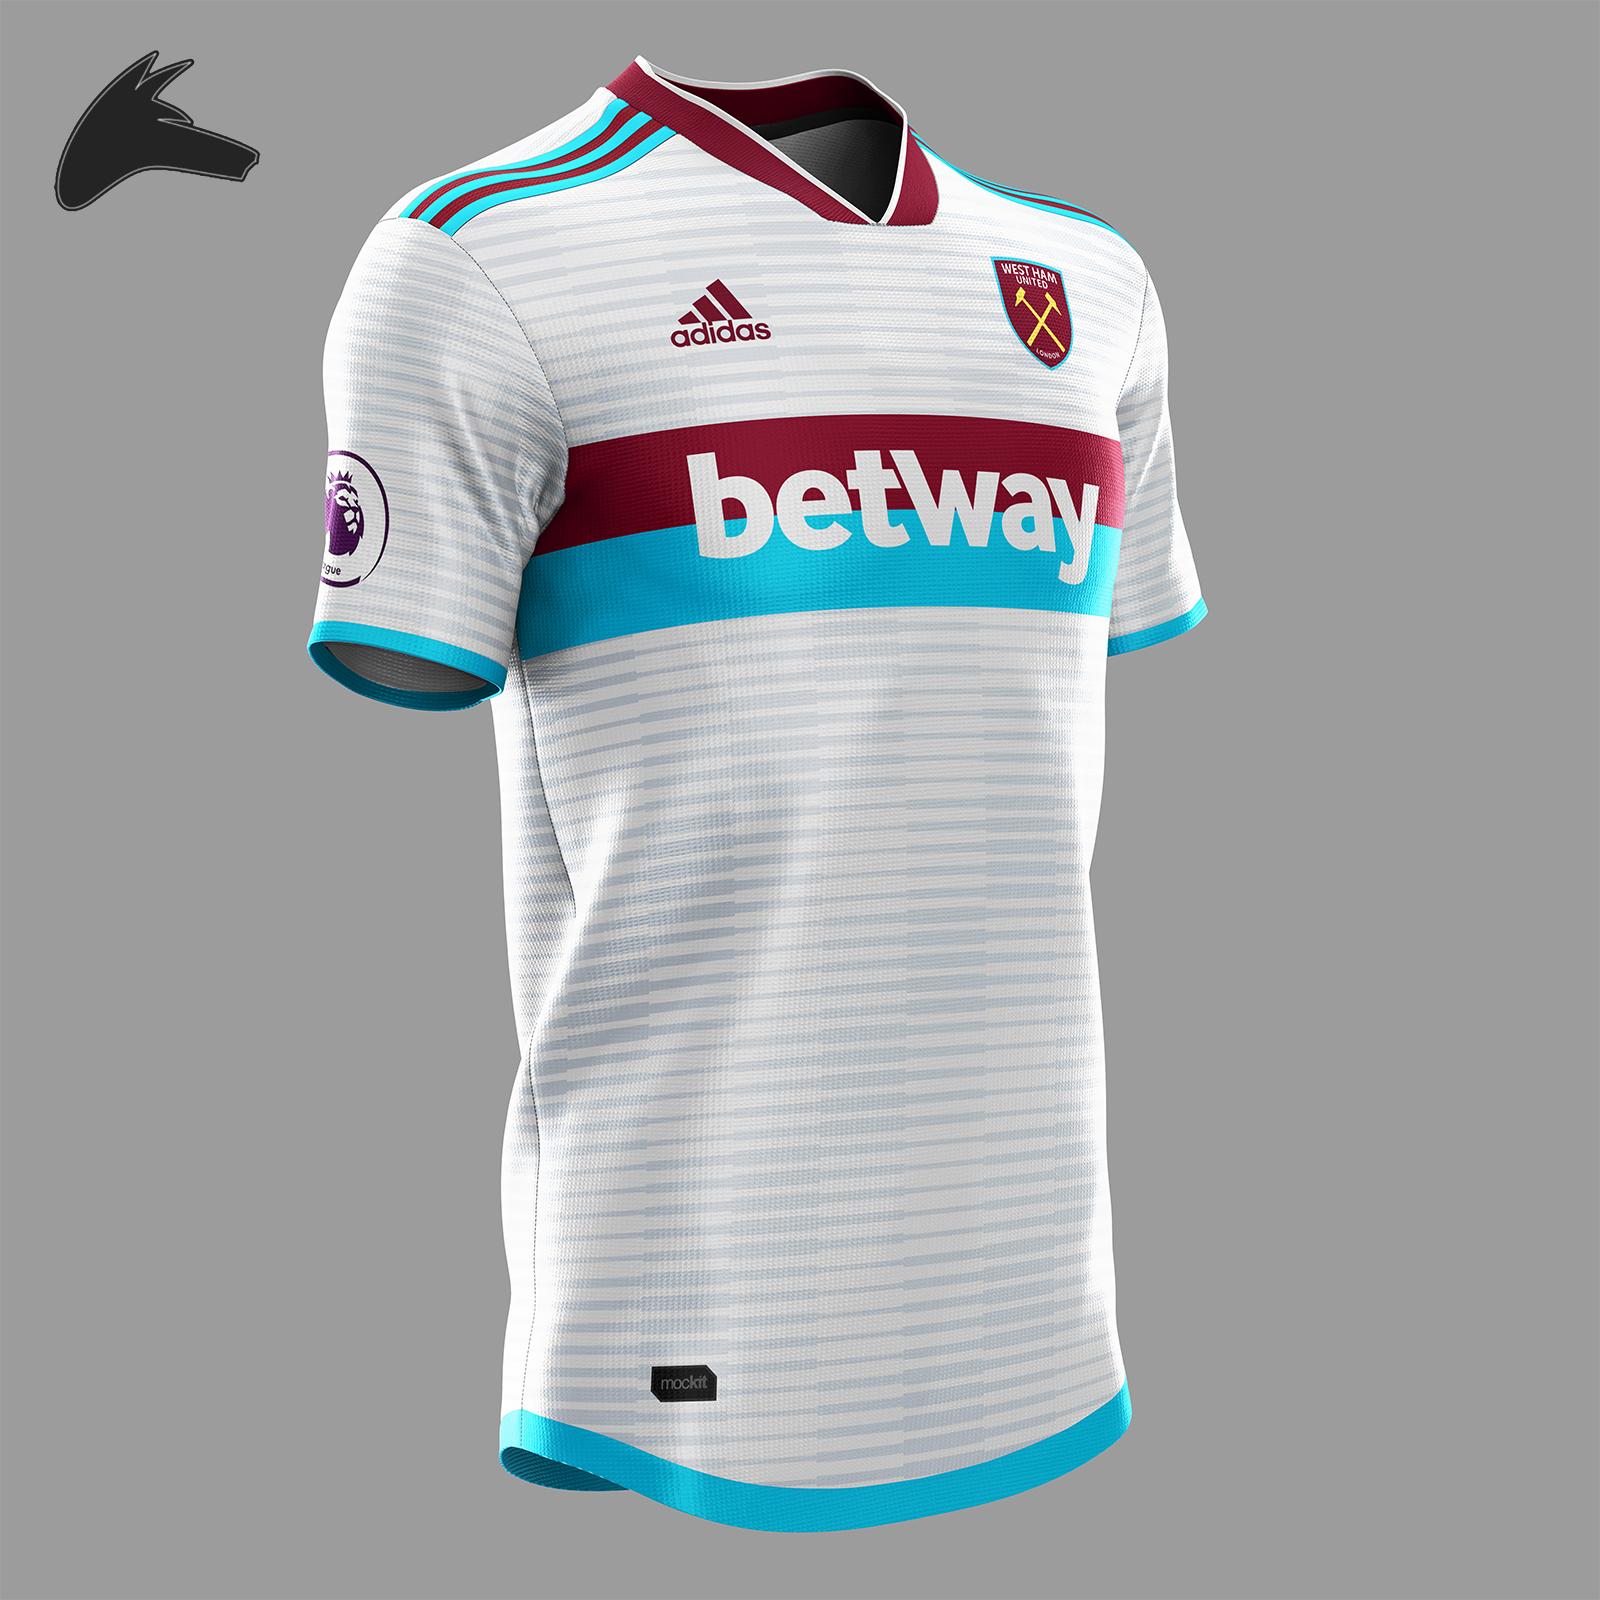 huge discount a7ff0 7cfab West Ham x Adidas third concept